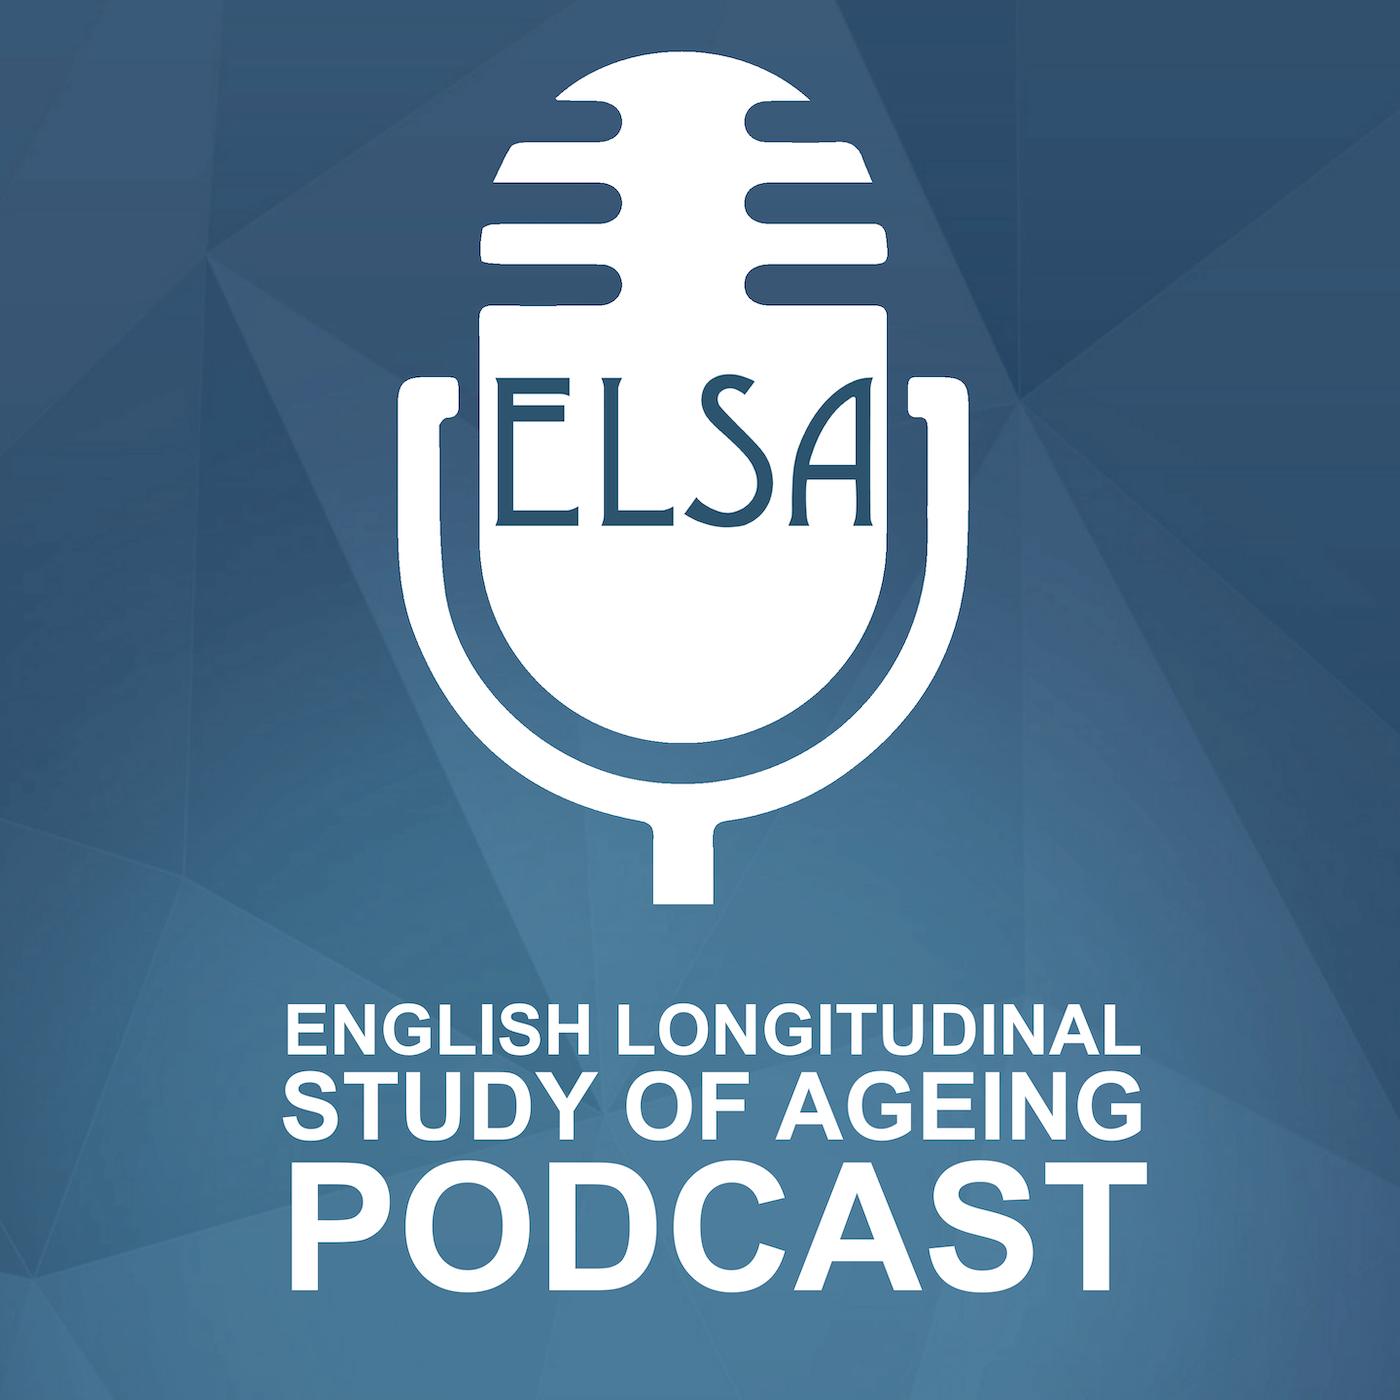 The ELSA Podcast